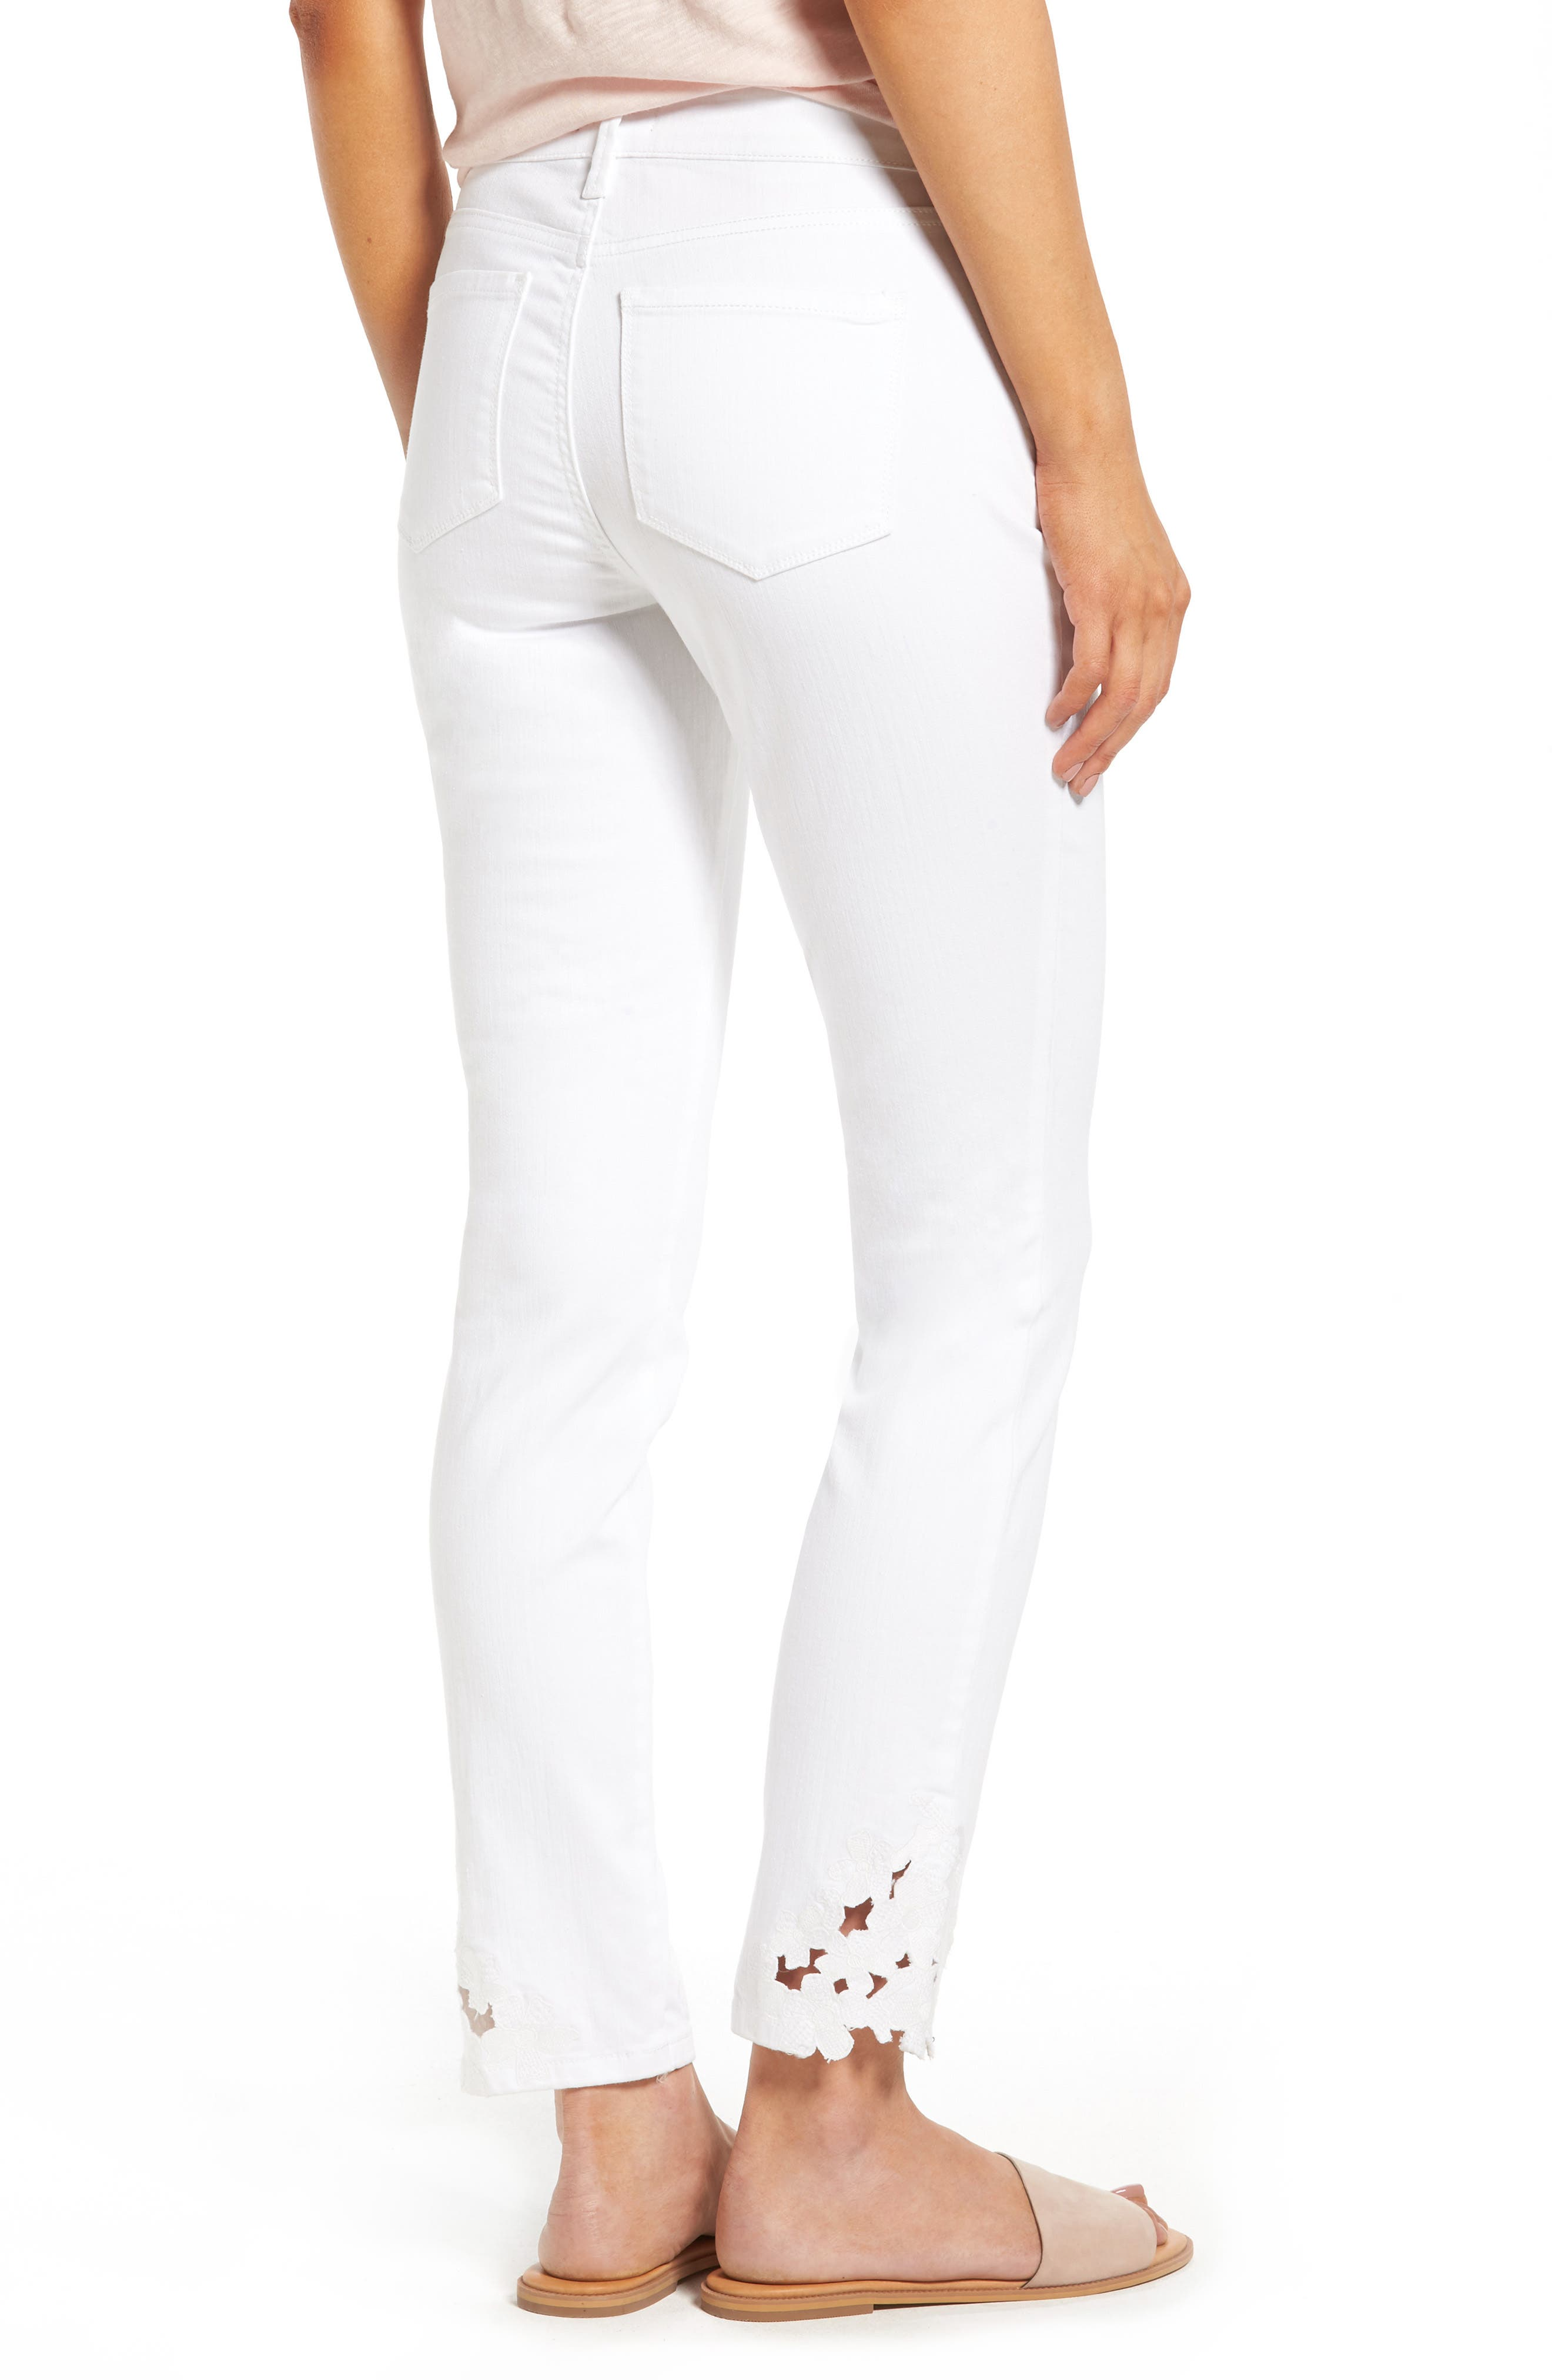 Alternate Image 3  - NYDJ Alina Eyelet Hem Stretch Skinny Jeans (Optic White) (Regular & Petite)